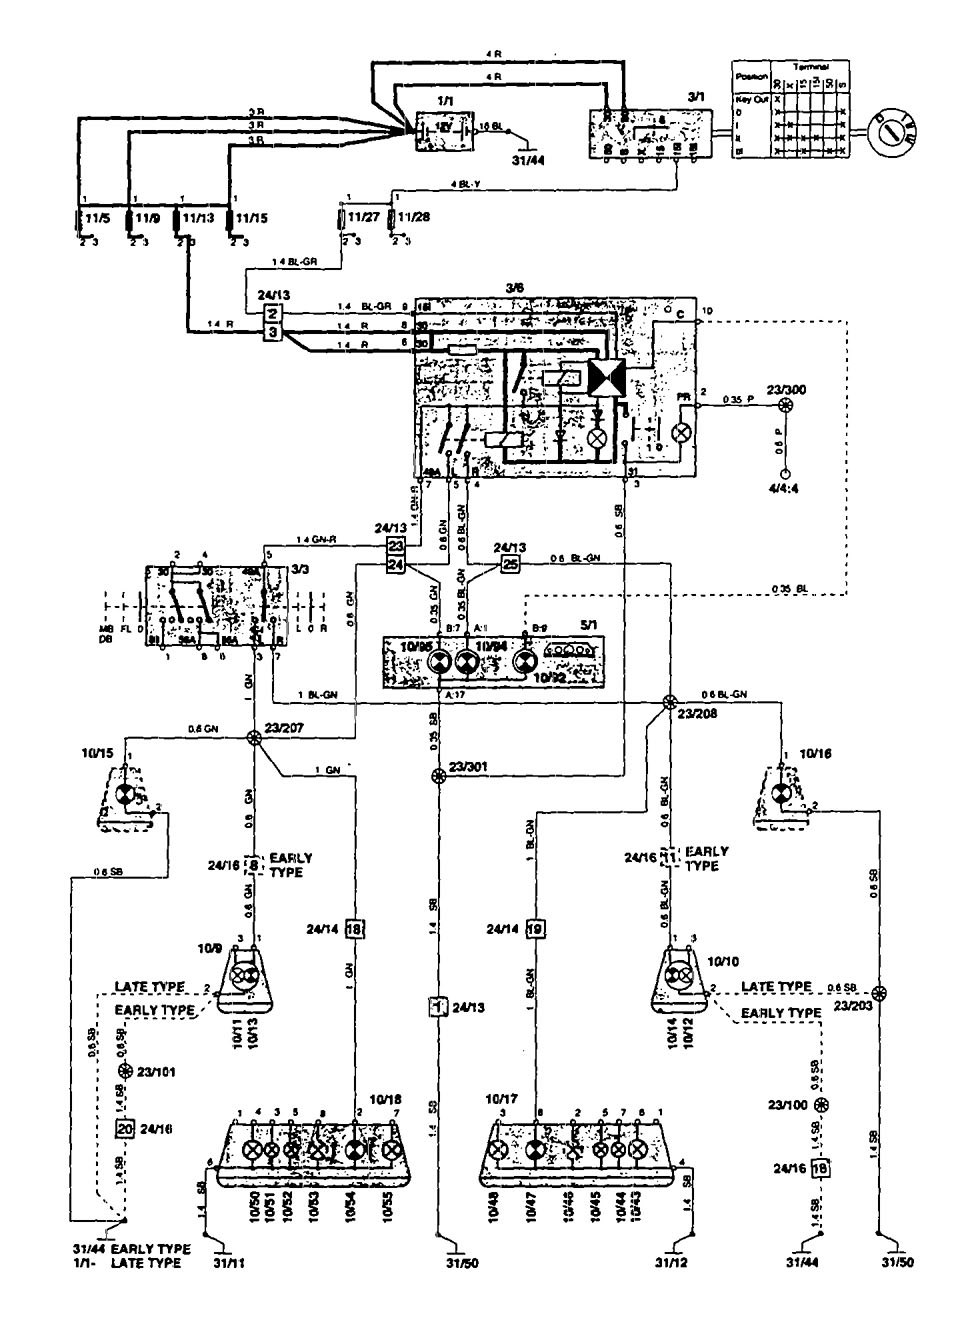 [SCHEMATICS_4LK]  Volvo 850 (1995) - wiring diagrams - turn signal lamp - Carknowledge.info | 240sx Turn Signal Wiring Diagram |  | Carknowledge.info